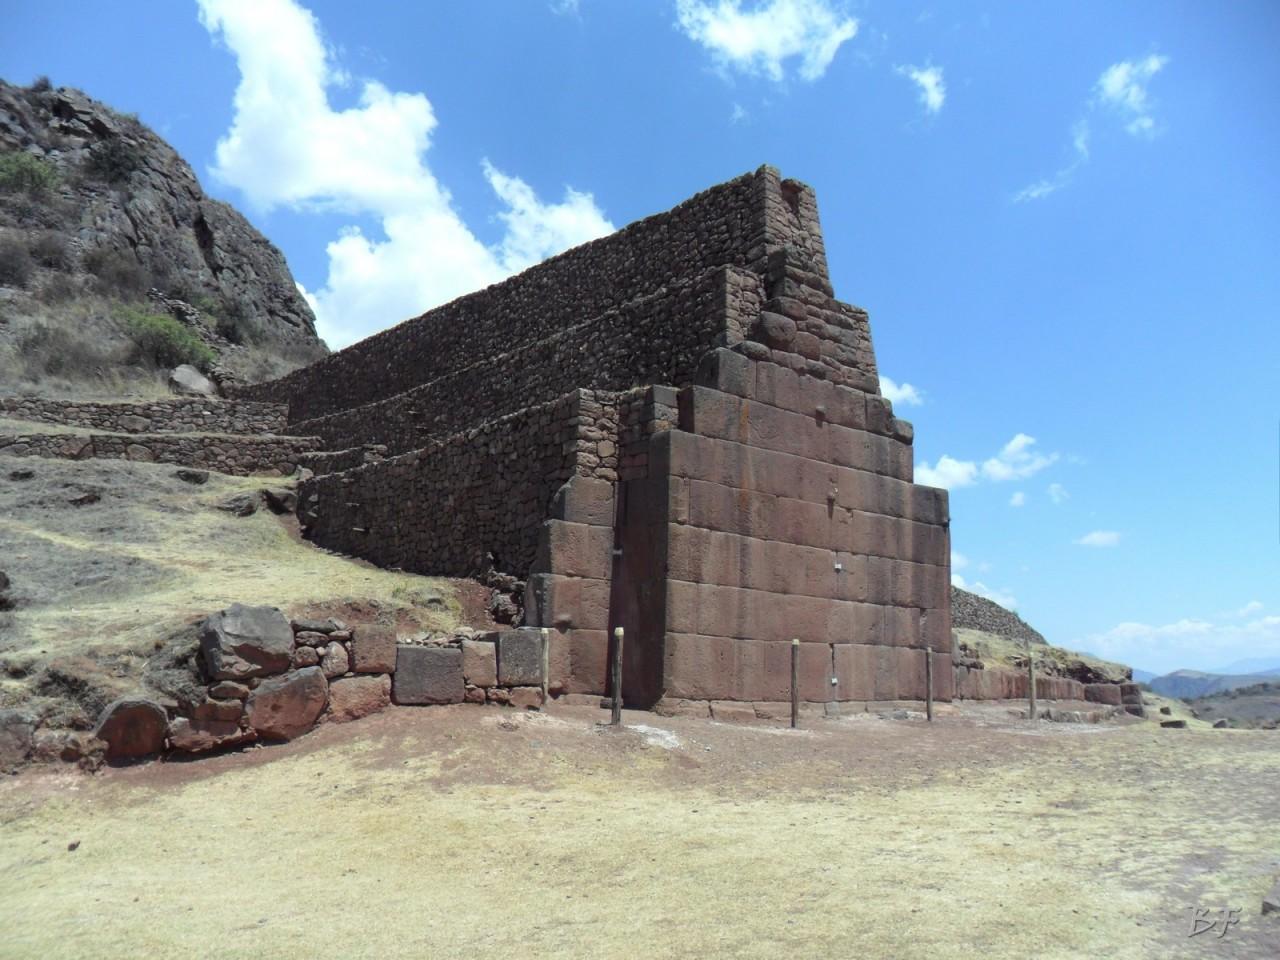 Parco-Archeologico-Megaliti-Rumicolca-Cusco-Perù-13